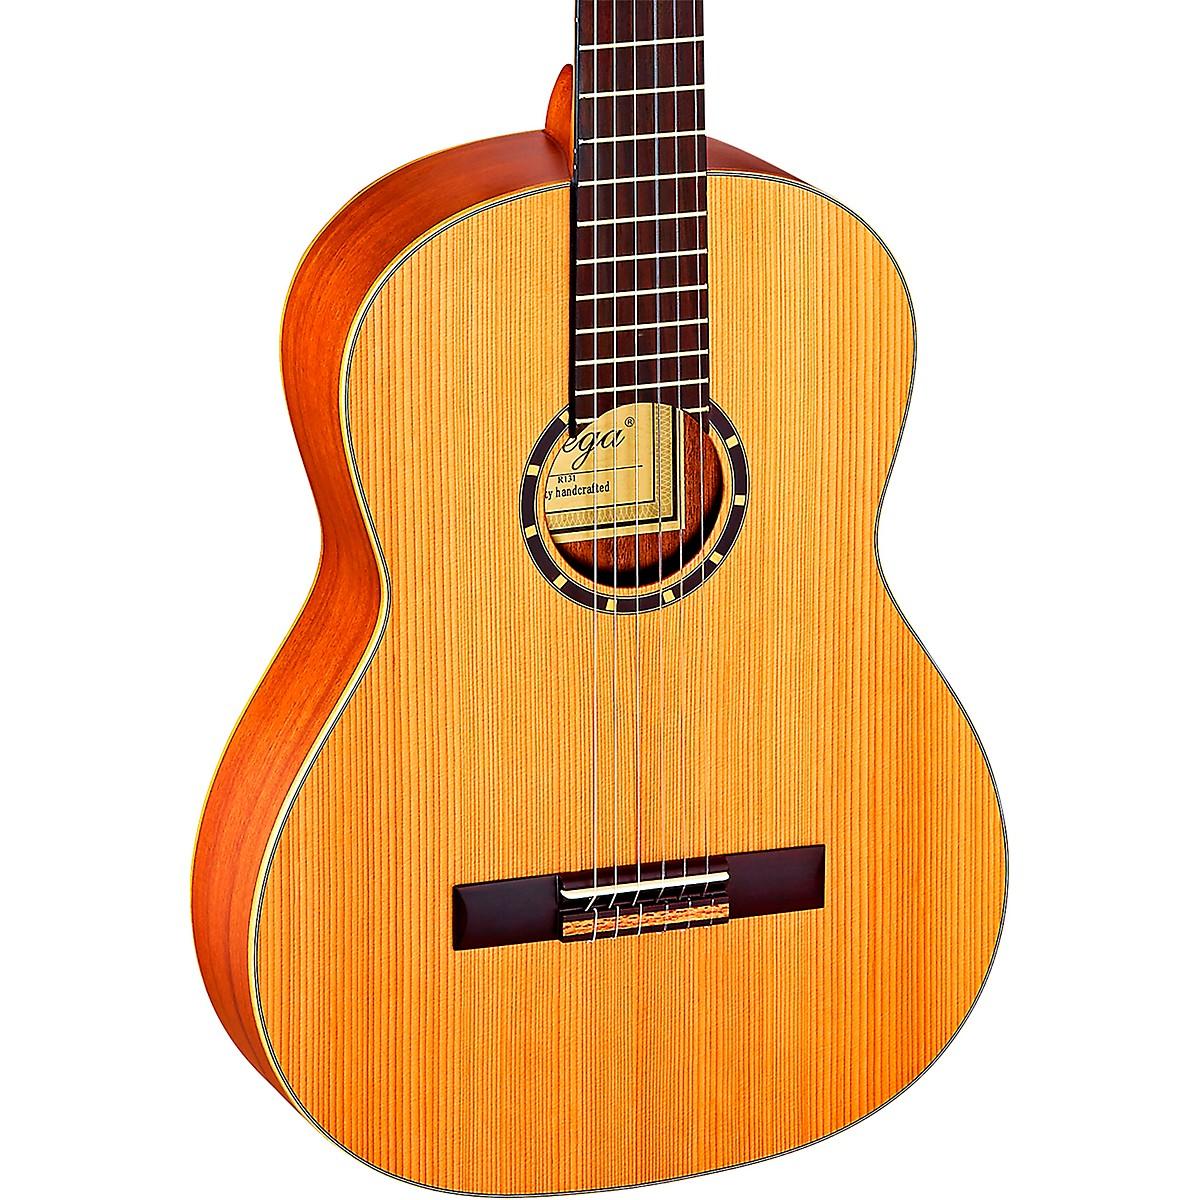 Ortega Family Series Pro R131SN Slim Neck Classical Guitar